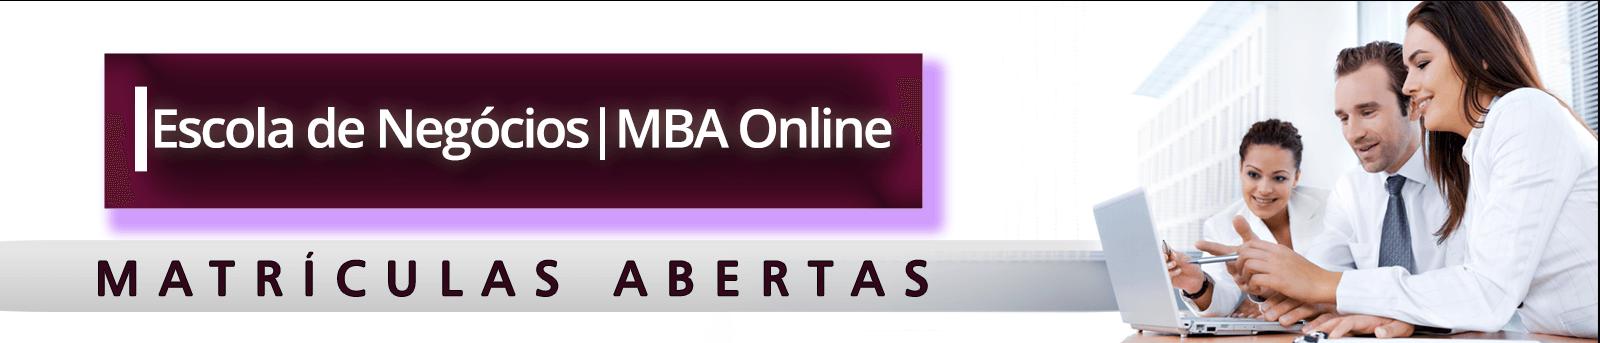 IDCE - Escola de Negócios MBA Online